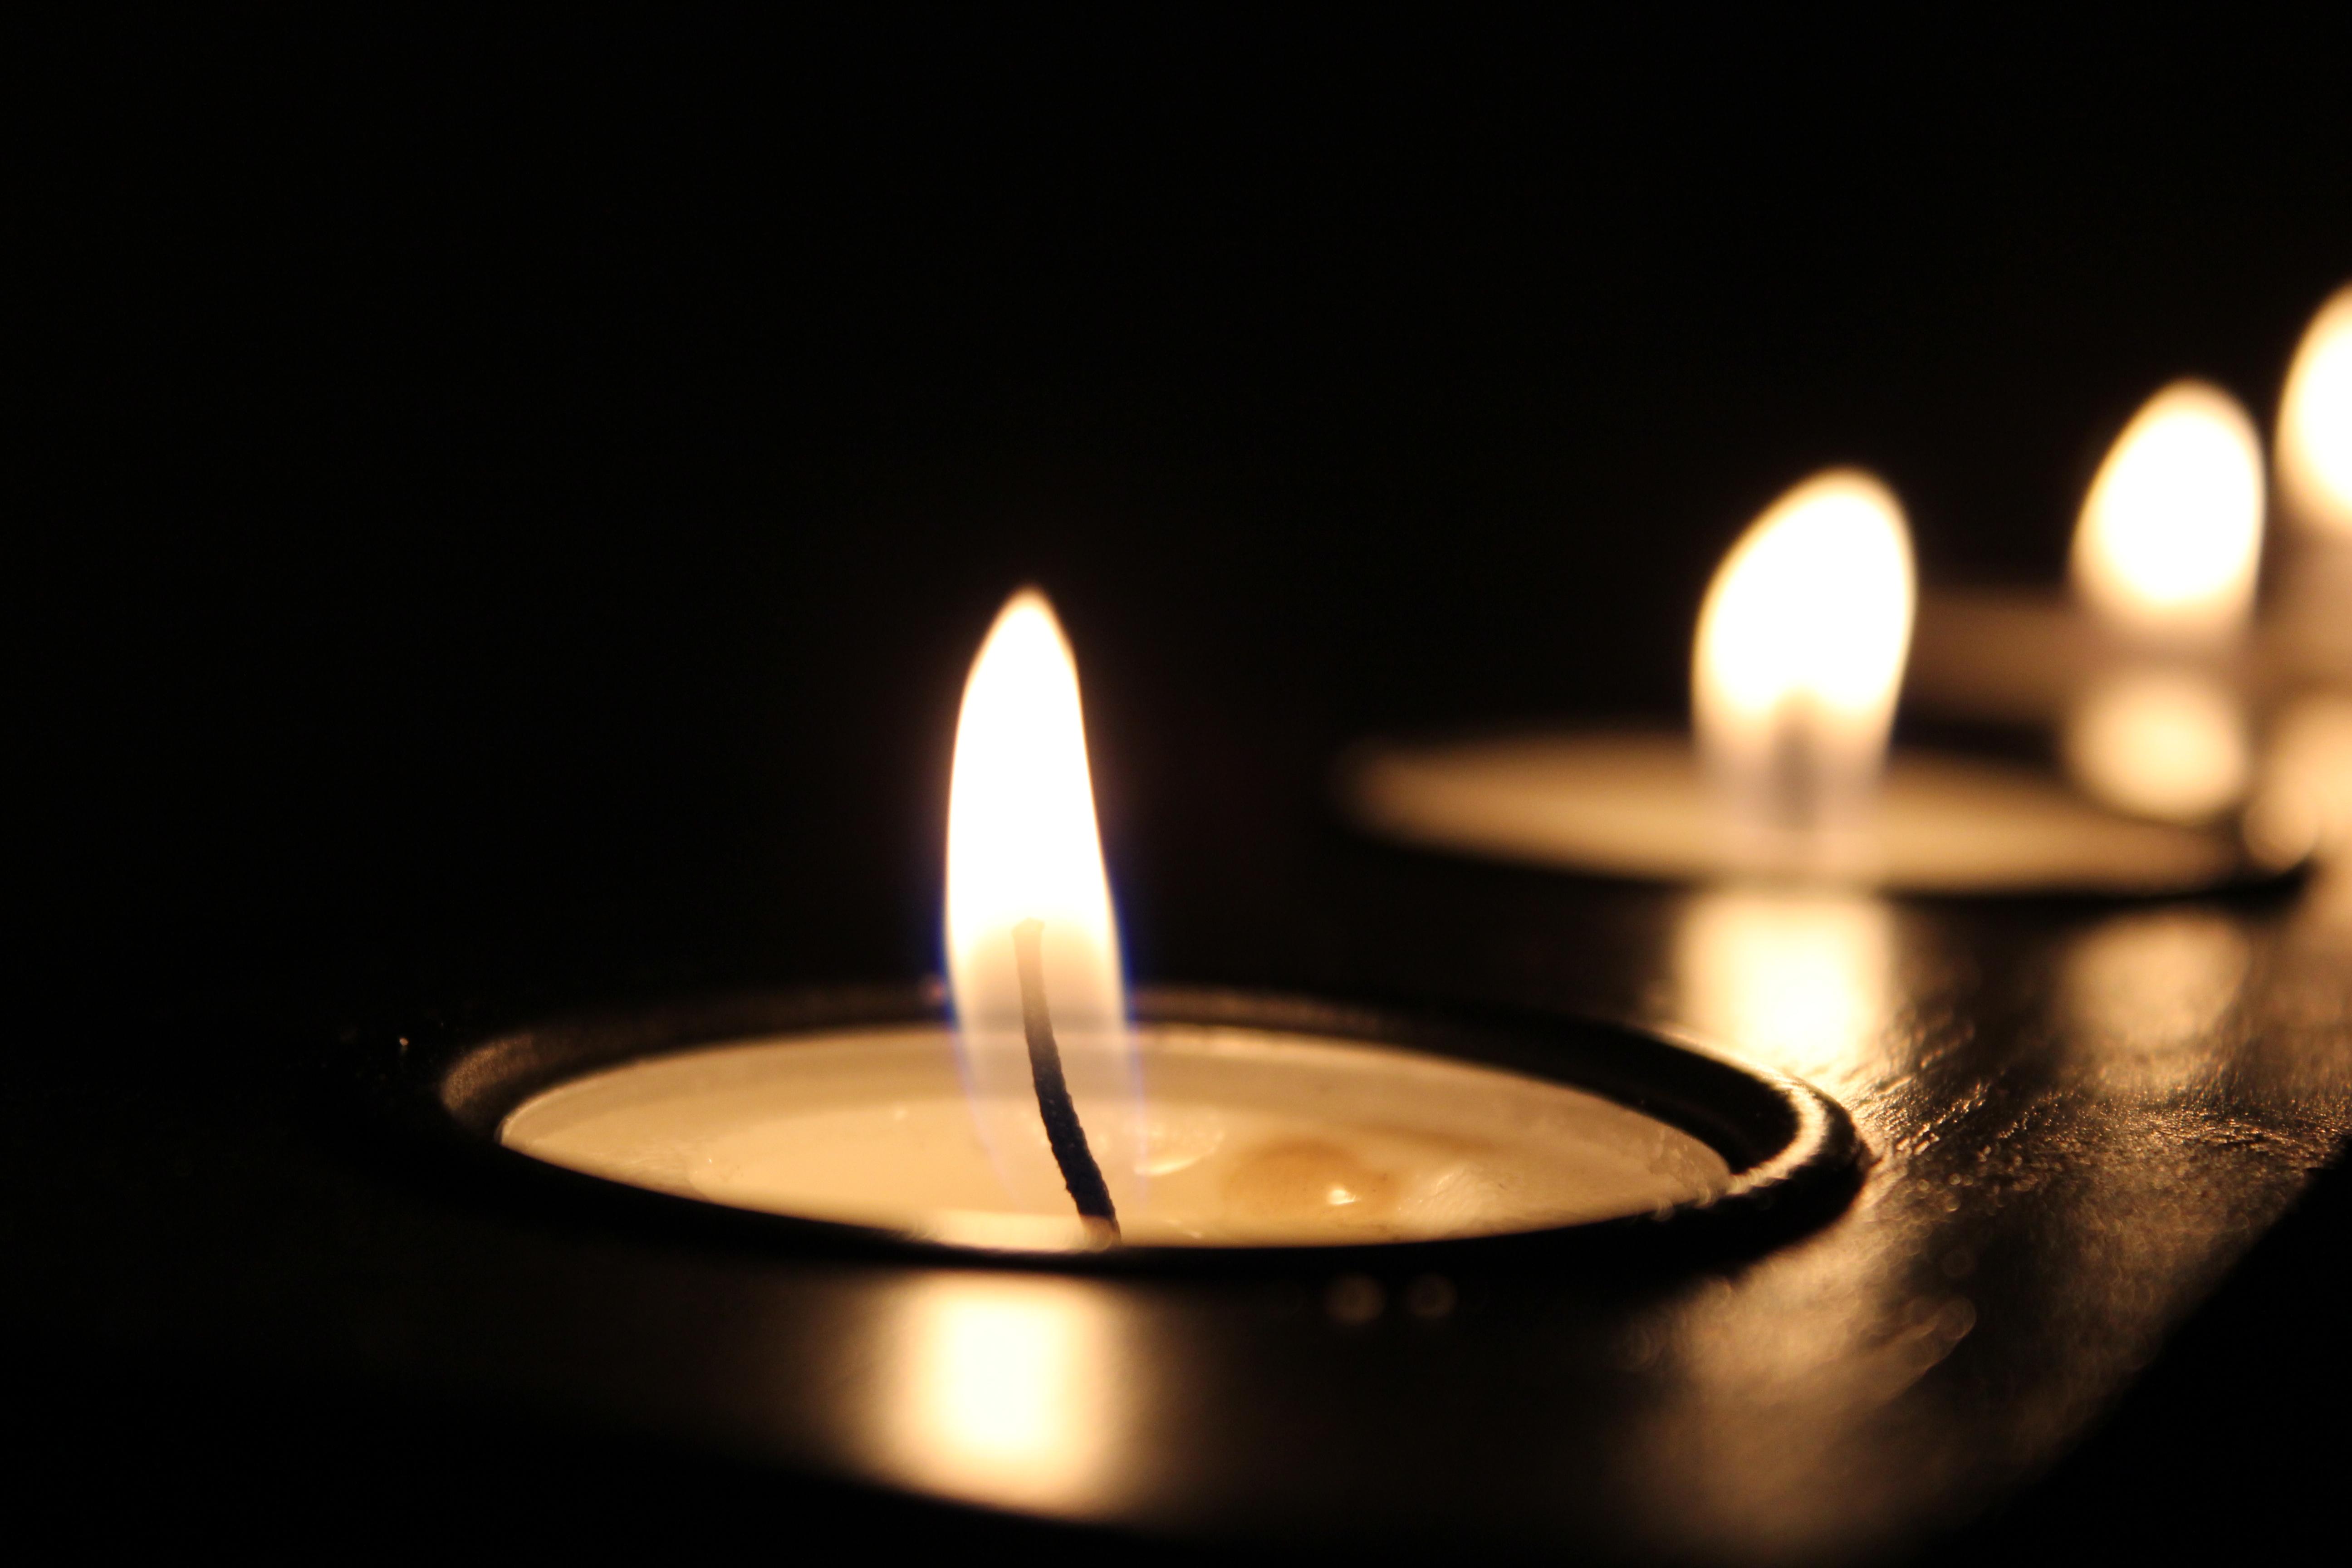 Free Images : light, blur, dark, celebration, flame ...